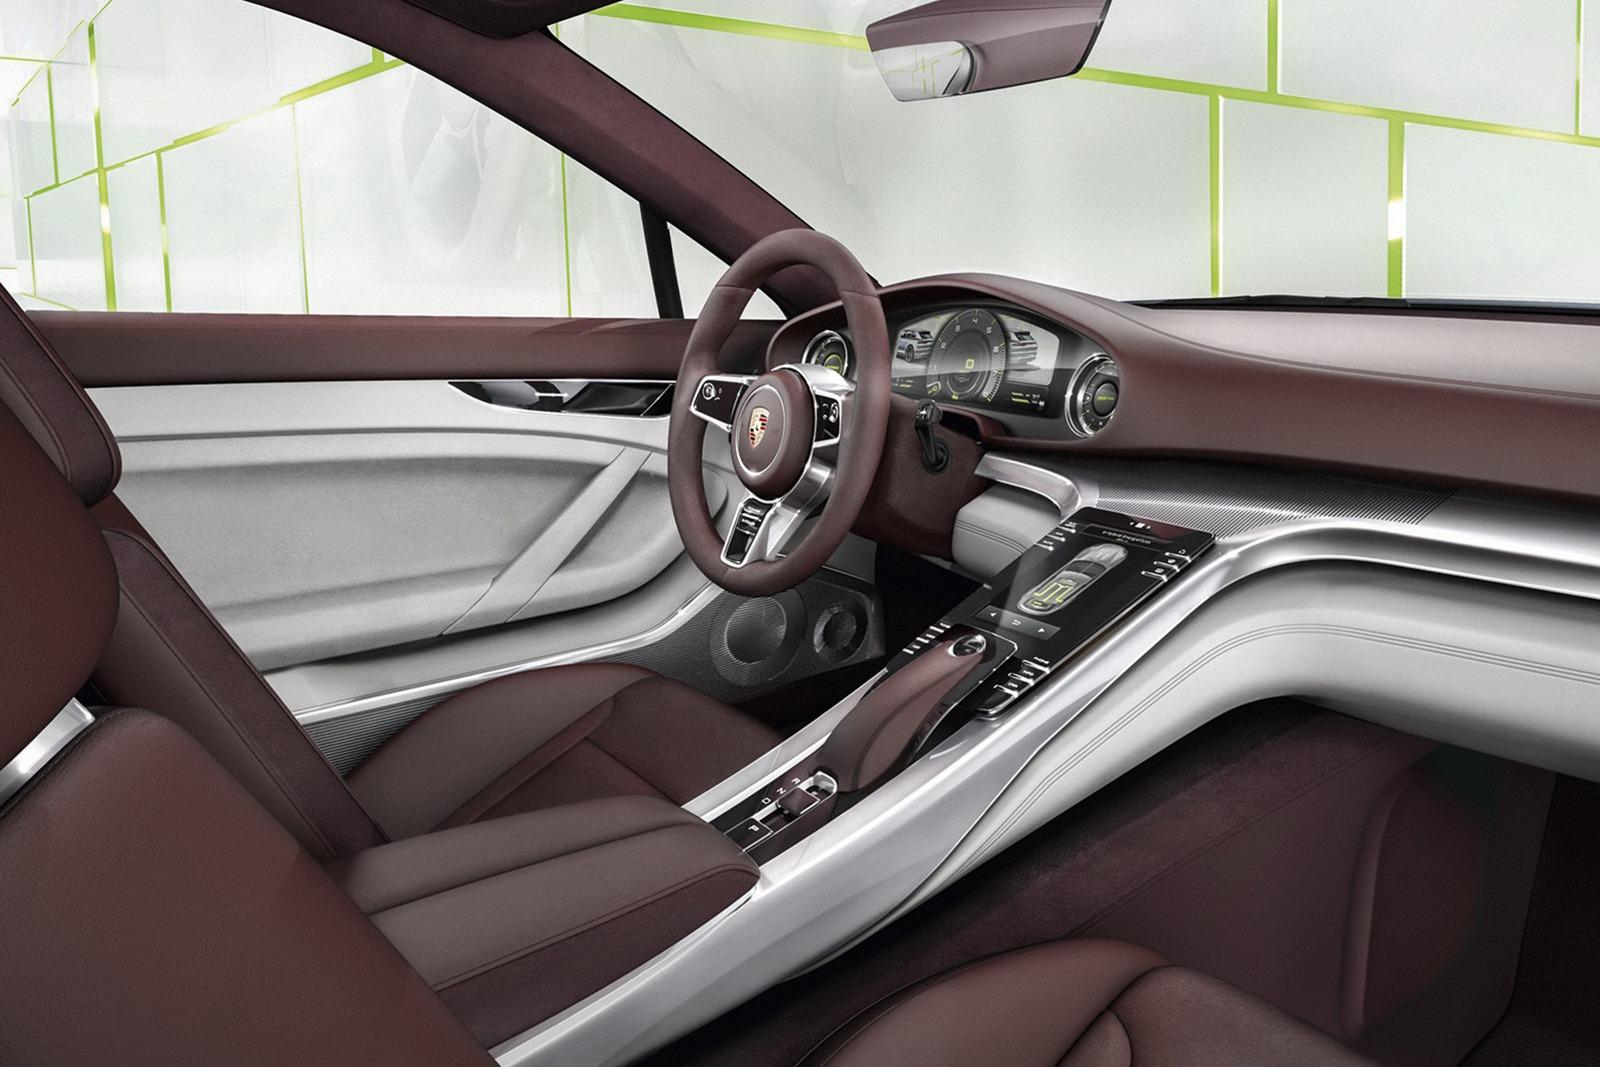 Paris 2012: Porsche Panamera Sport Turismo concept car previews future ...